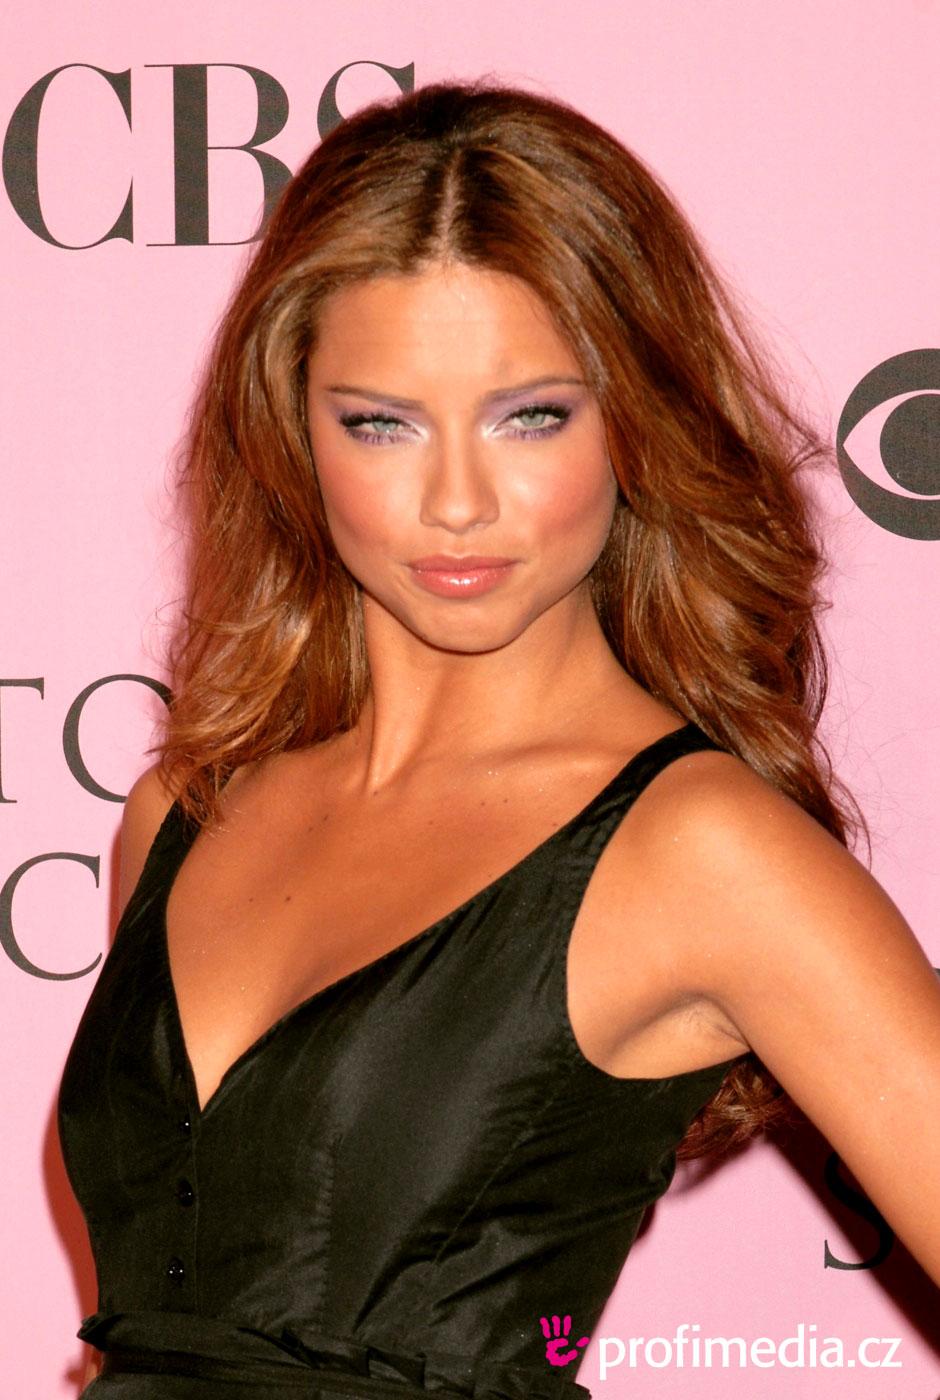 Adriana Lima Hairstyle Easyhairstyler